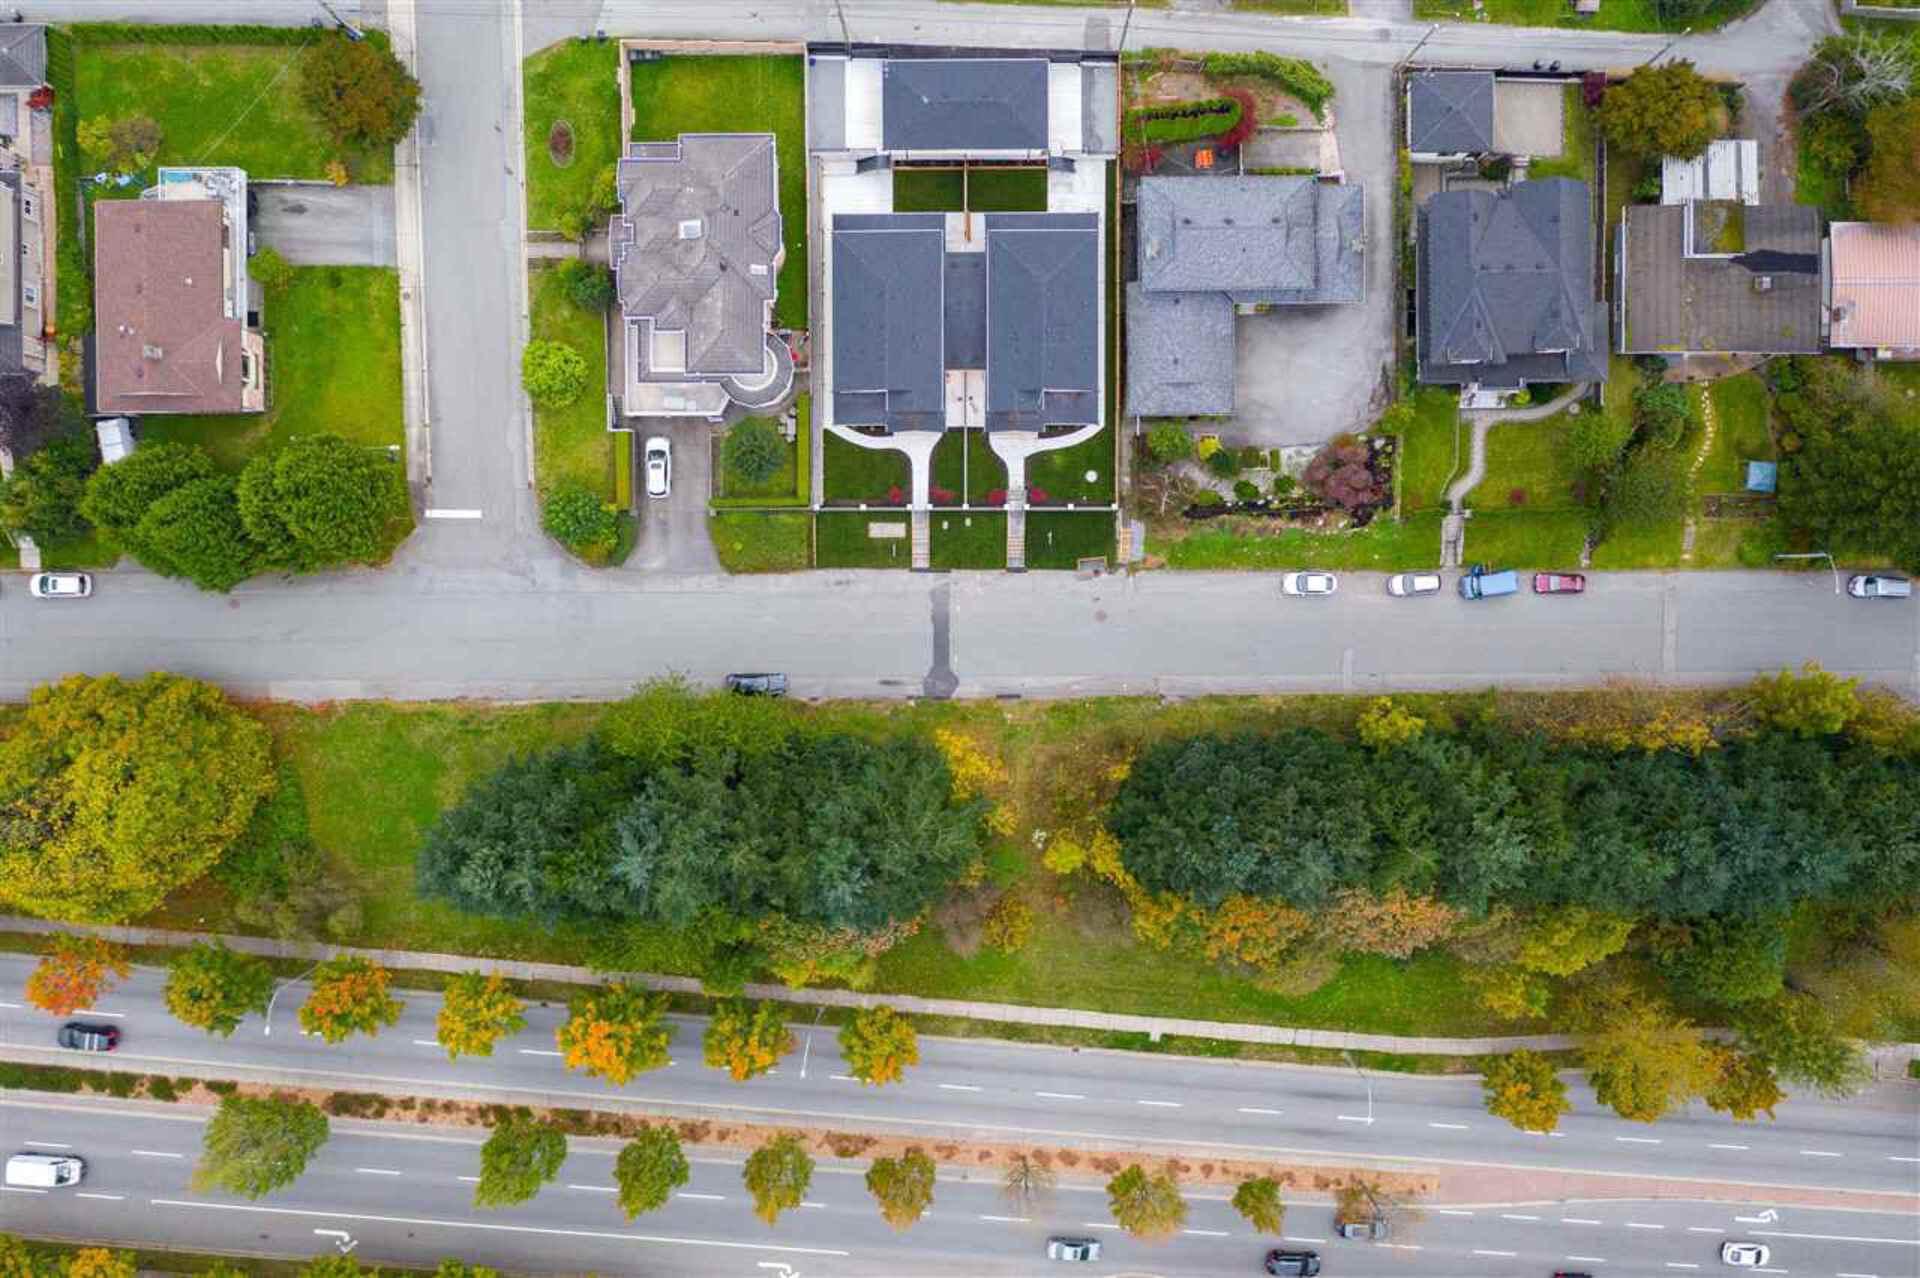 5607-royal-oak-avenue-forest-glen-bs-burnaby-south-33 at 5607 Royal Oak Avenue, Forest Glen BS, Burnaby South